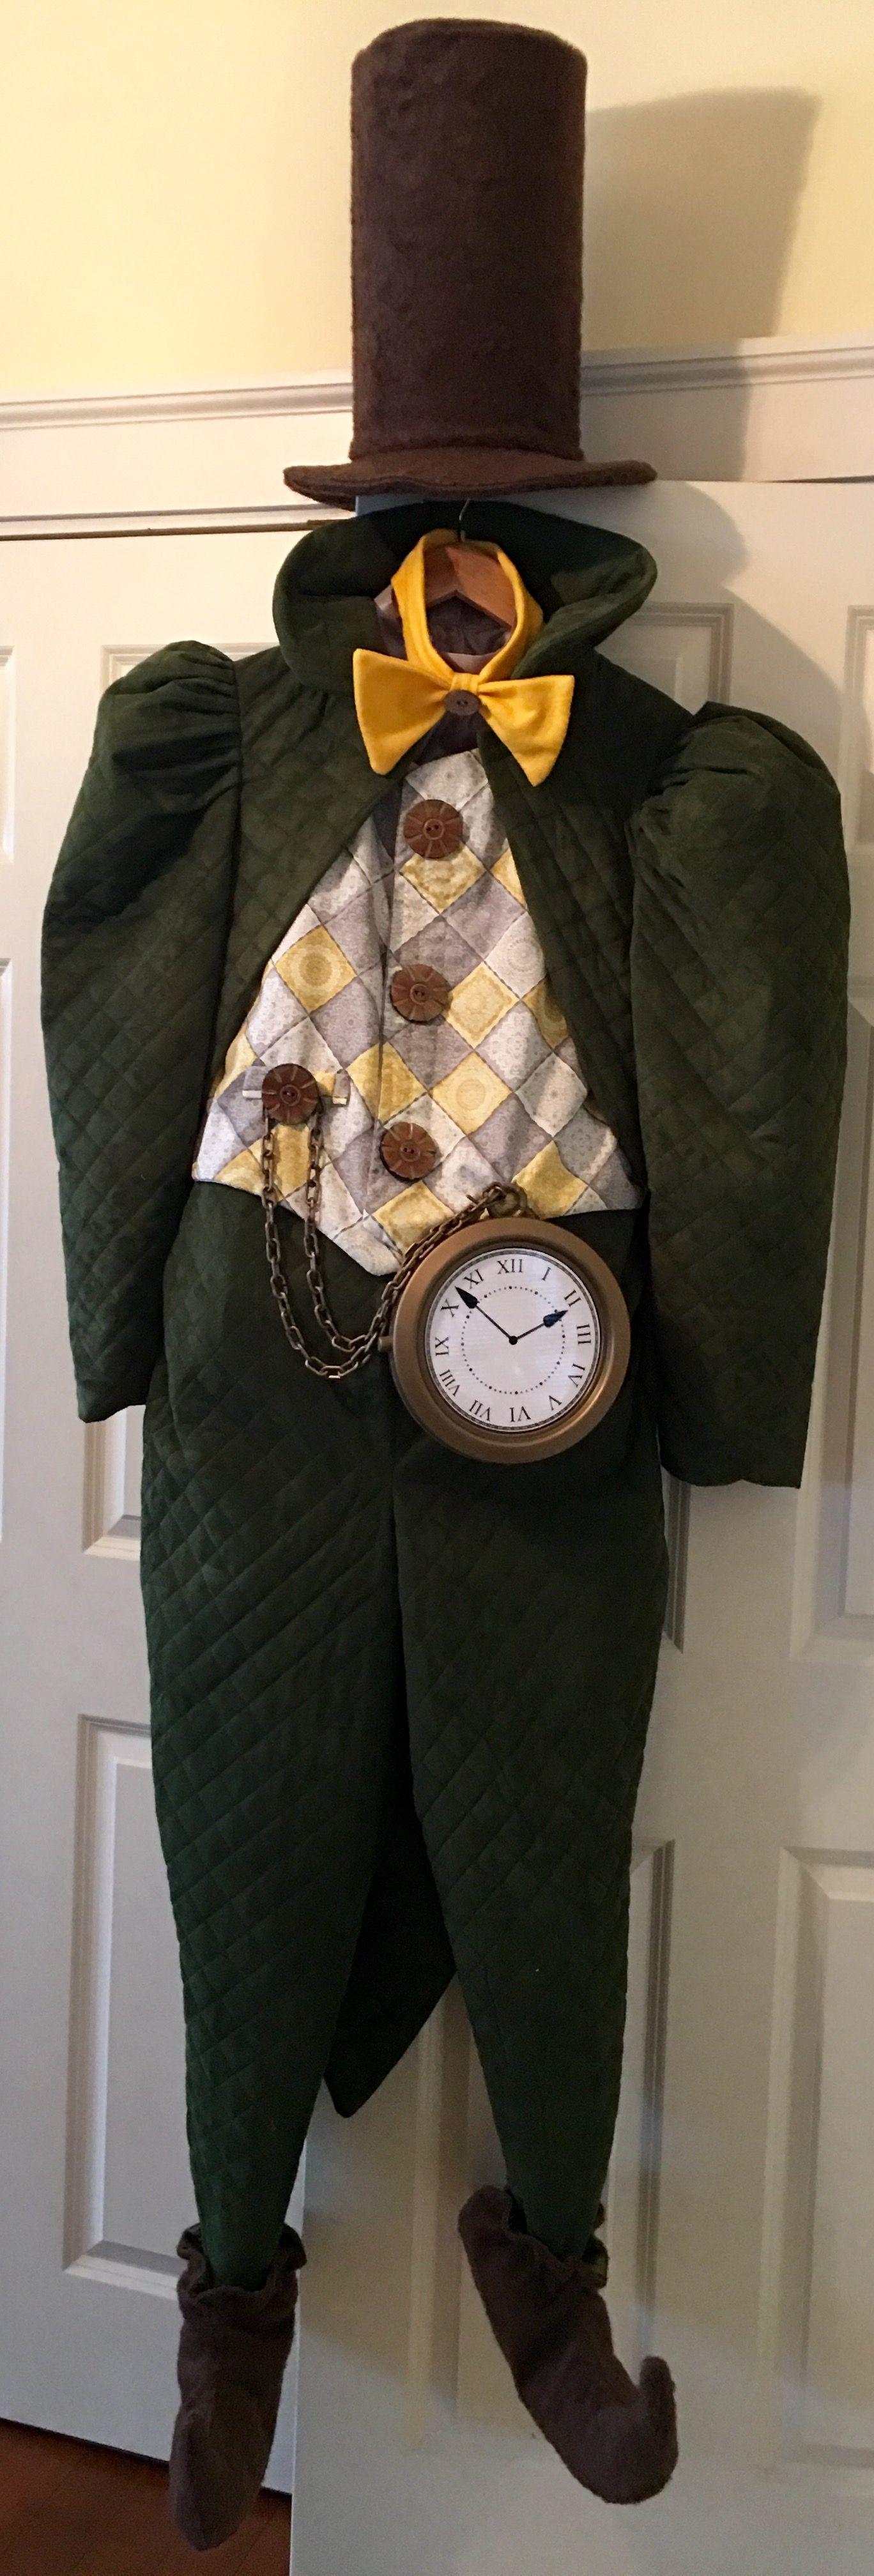 Challenging Tin Man Costume | The o'jays, Tins and Tin man costumes